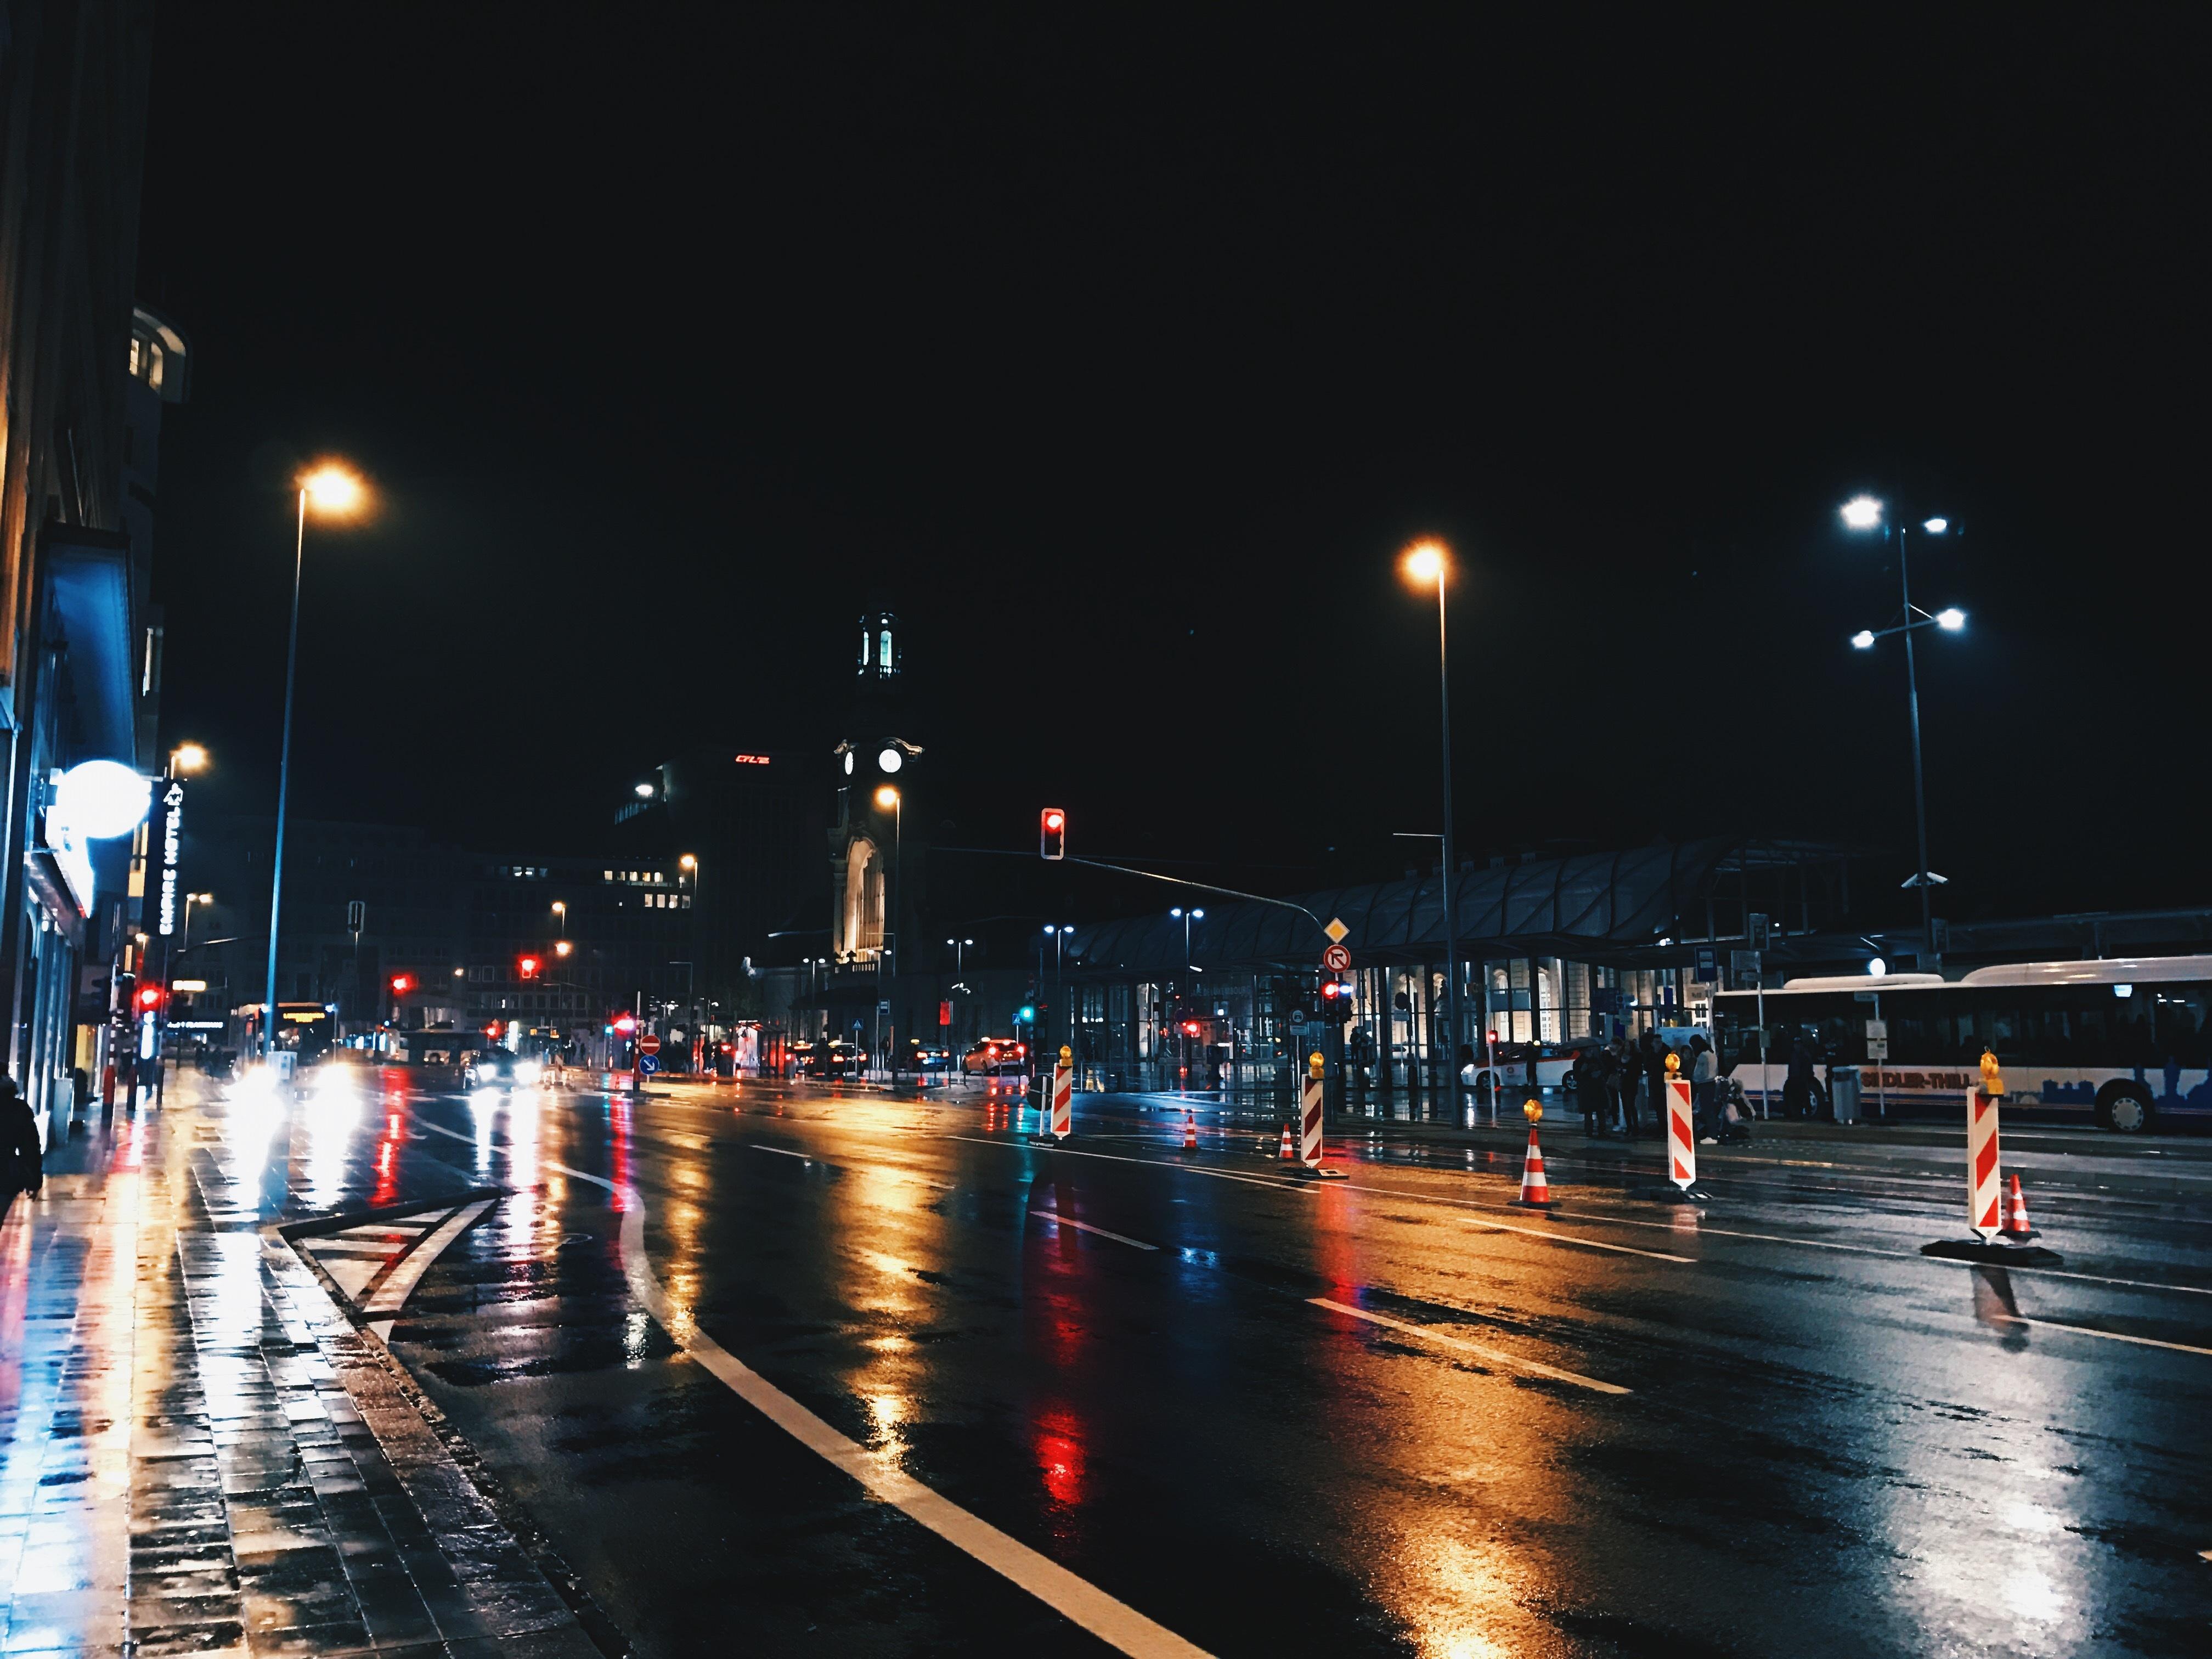 Gambar Cahaya Malam Orang Banyak Pemandangan Kota Kegelapan